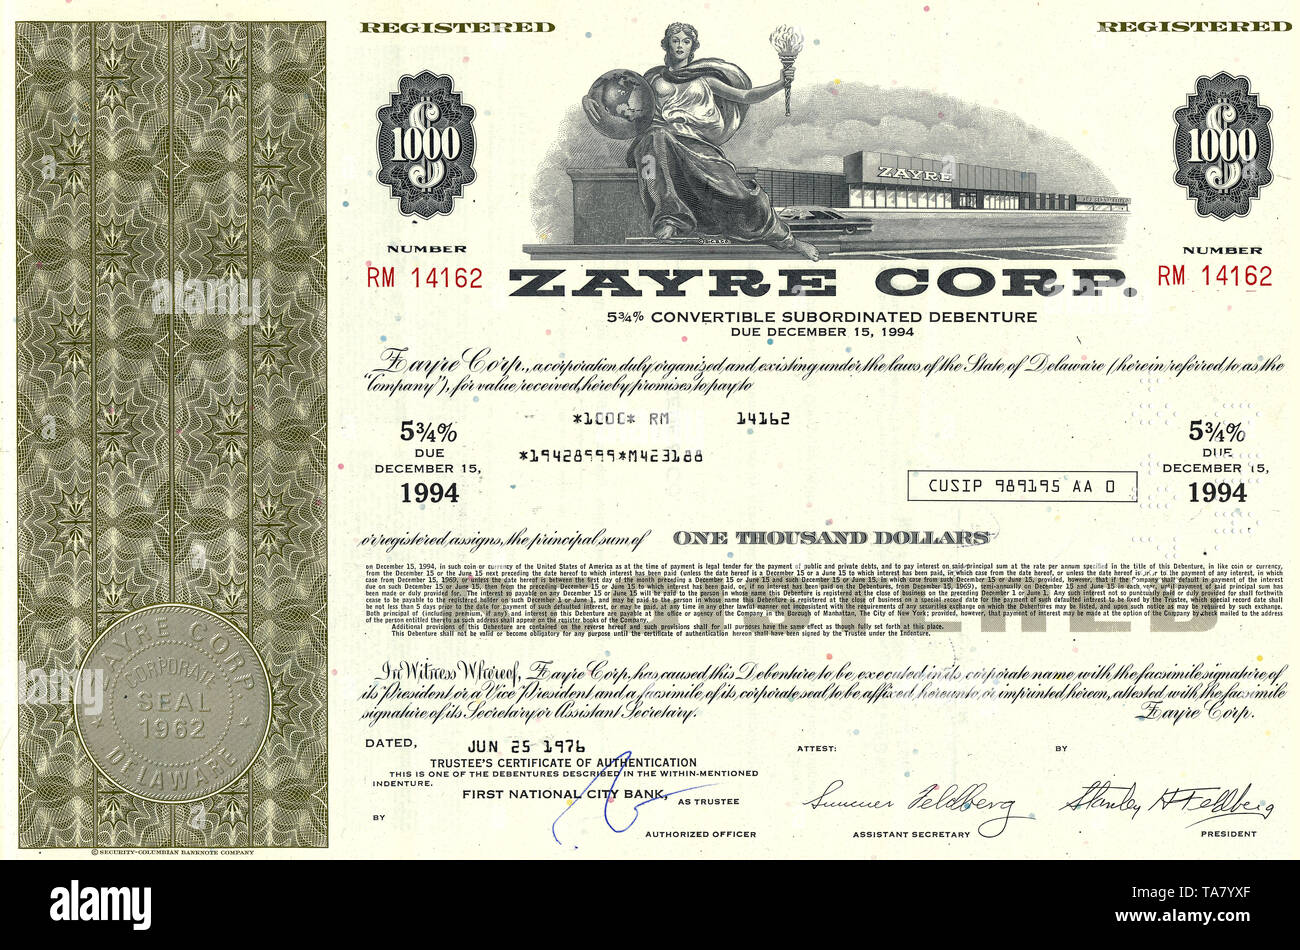 Historische Aktie, Einzelhandel, Zayre Corporation, 1976, Framingham, Massachusetts, USA, Historical stock certificate, retail, Zayre Corporation, 1976, Framingham, Massachusetts, USA - Stock Image